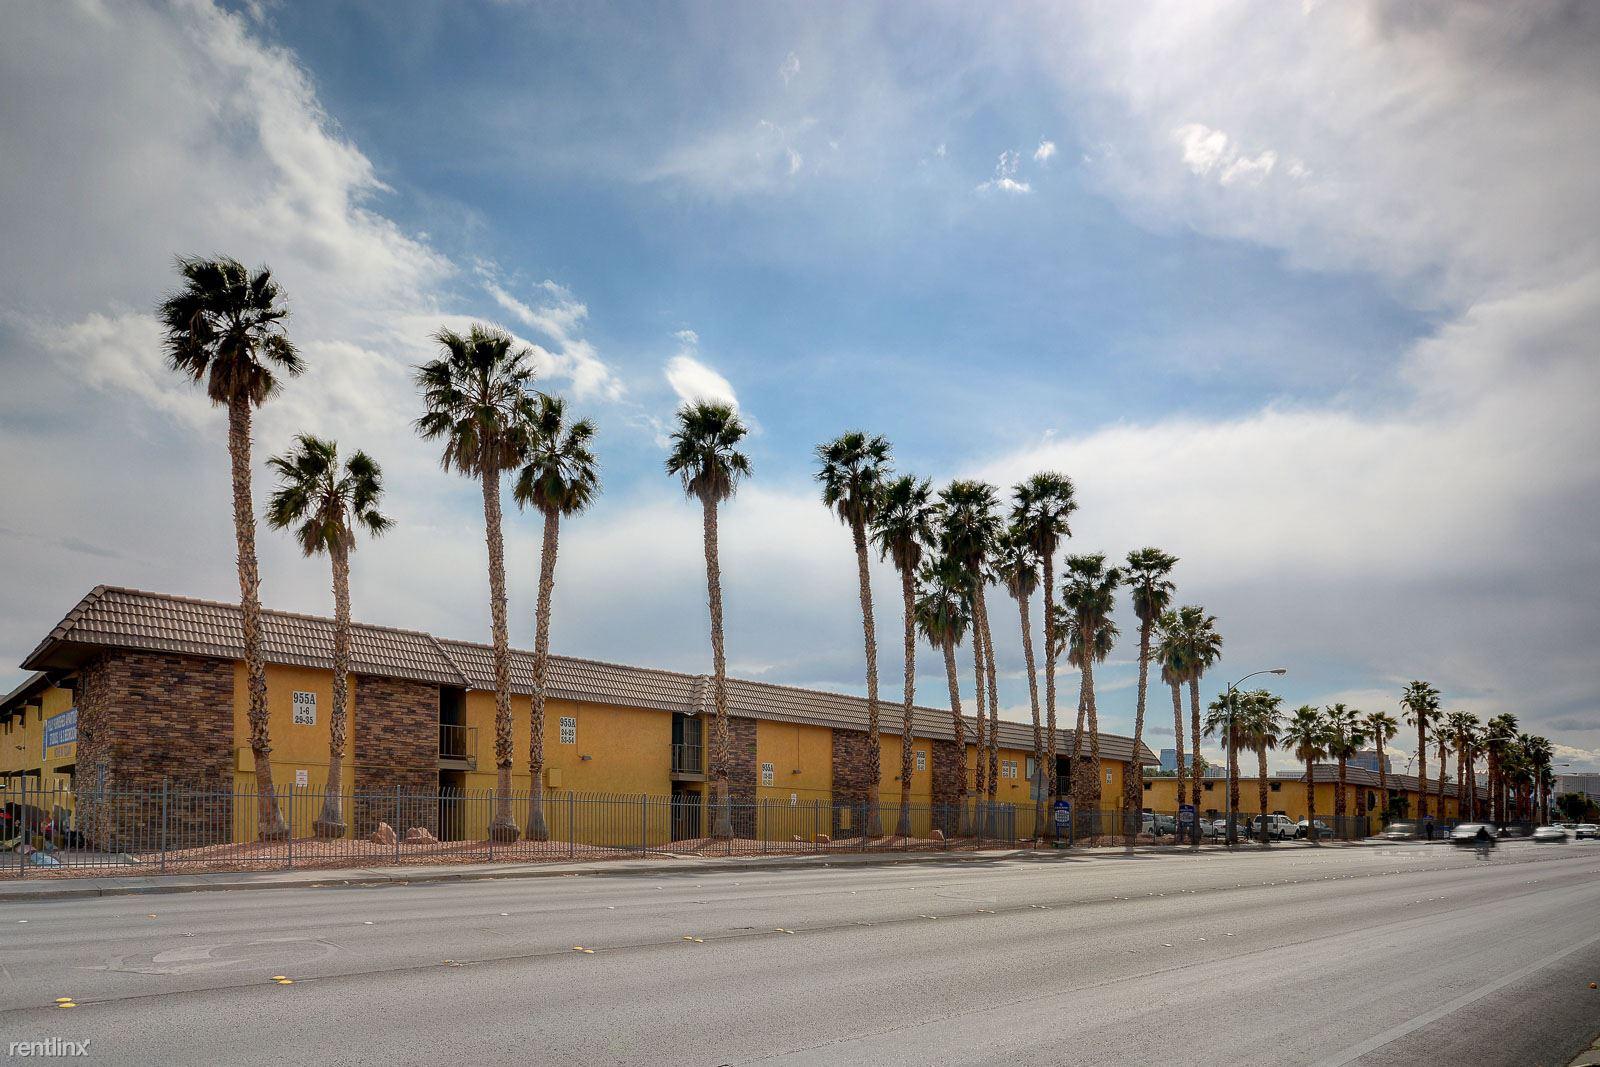 955 E Twain Ave, Las Vegas, NV - $841